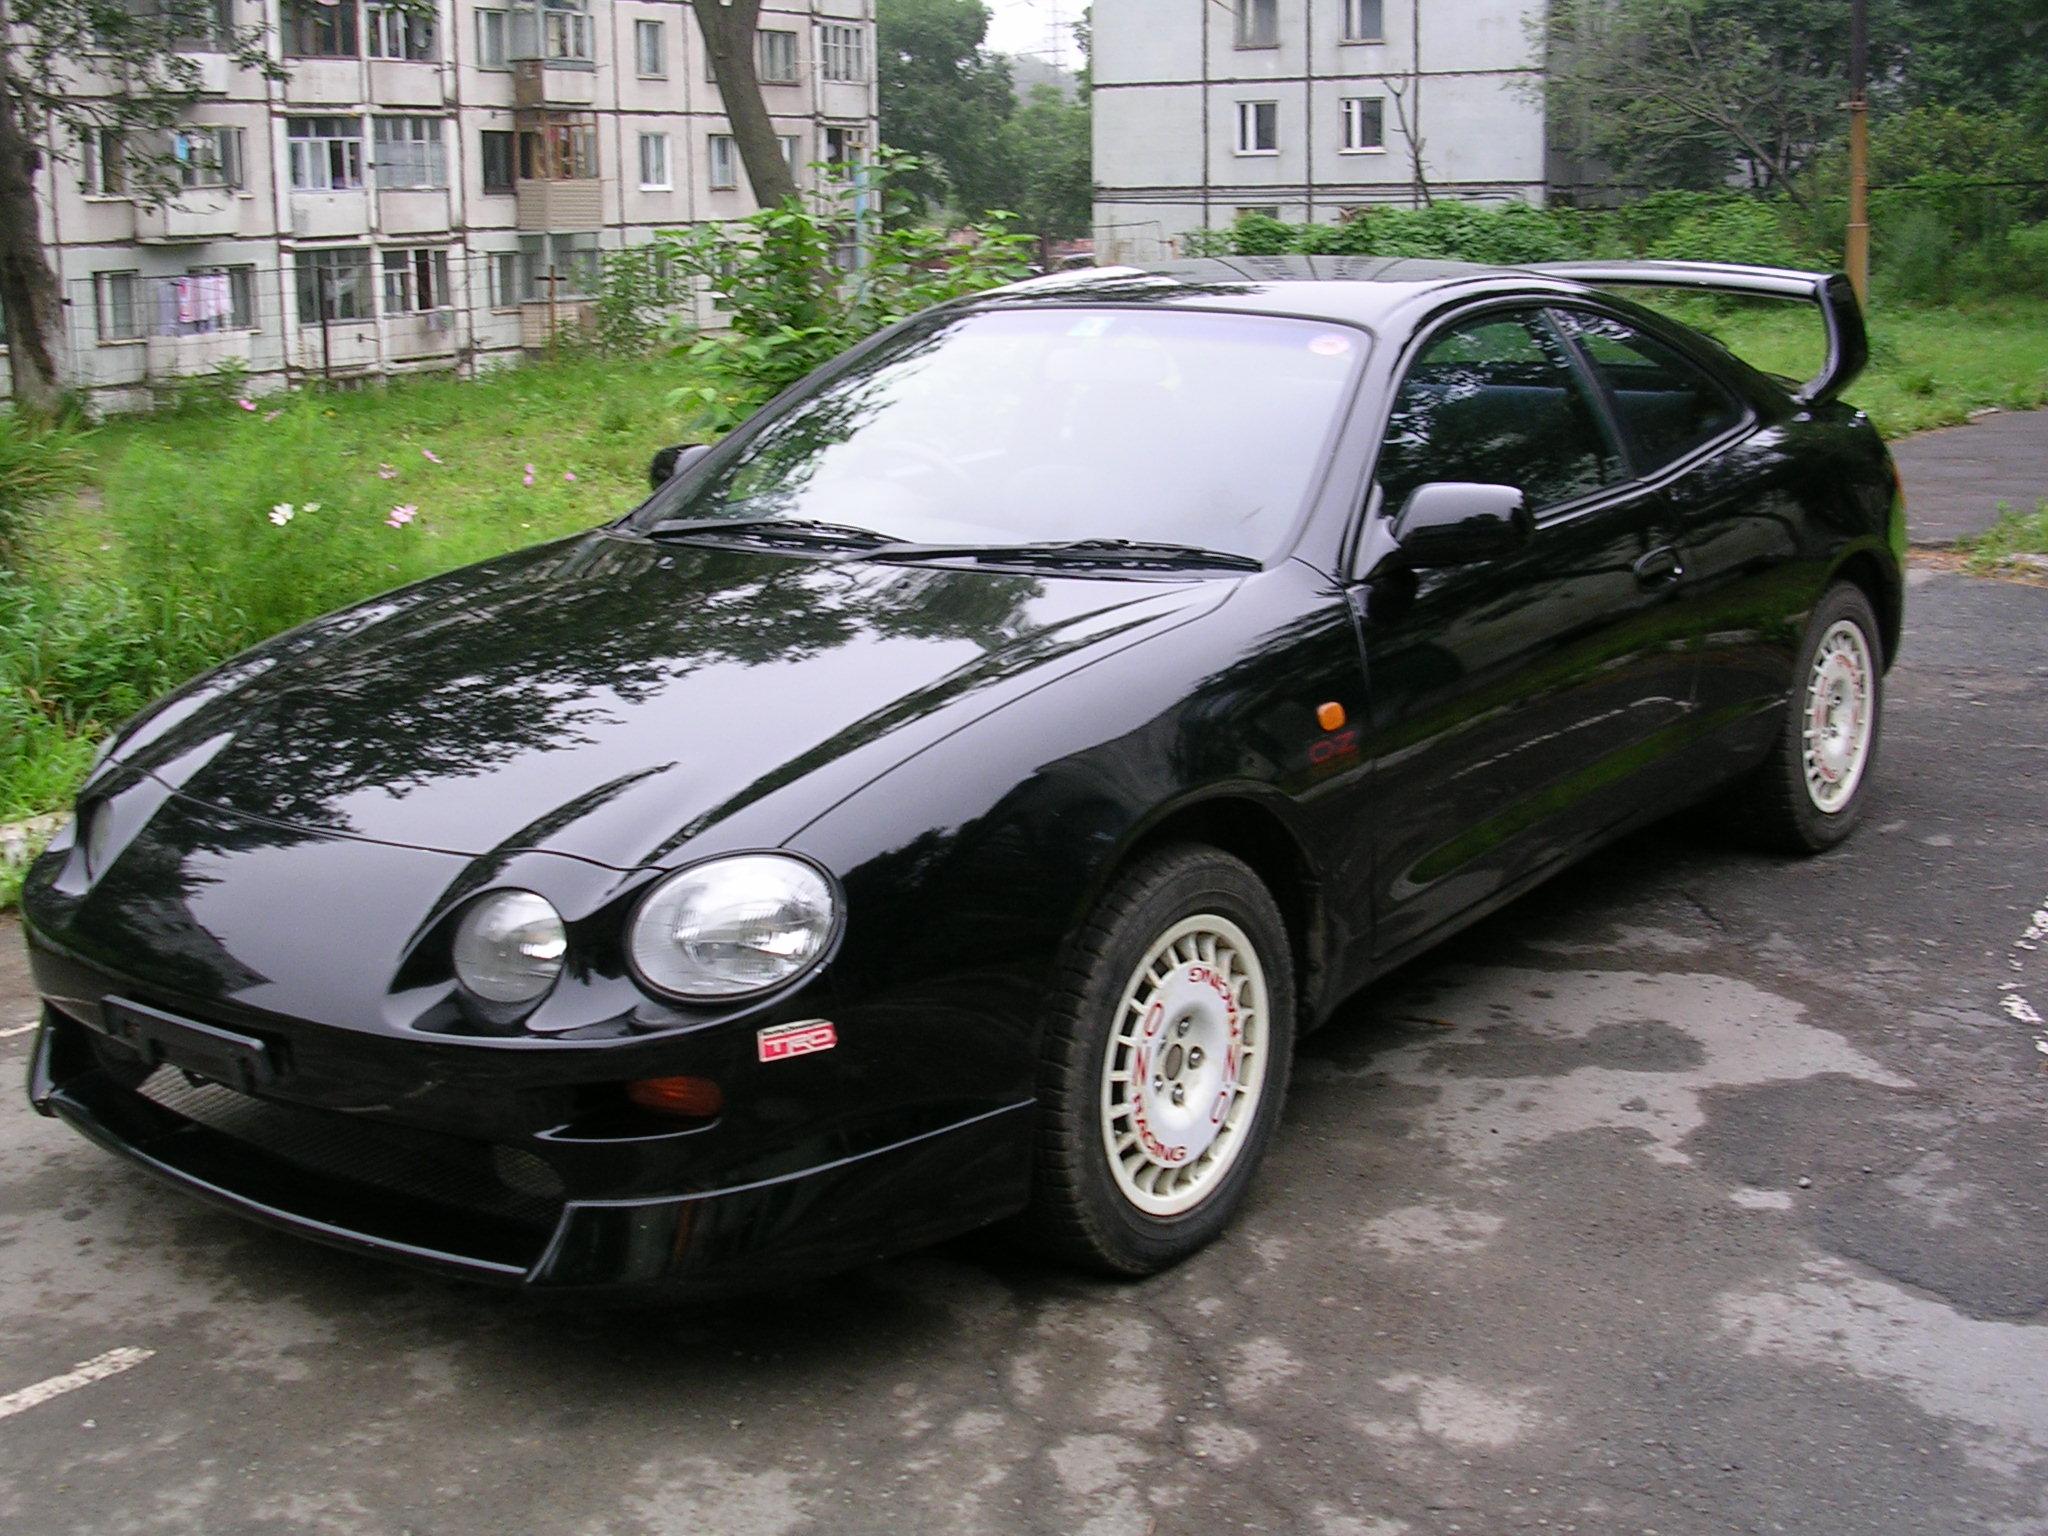 1994 Toyota Celica Engine - Toyota Celica Toyota Celica - 1994 Toyota Celica Engine